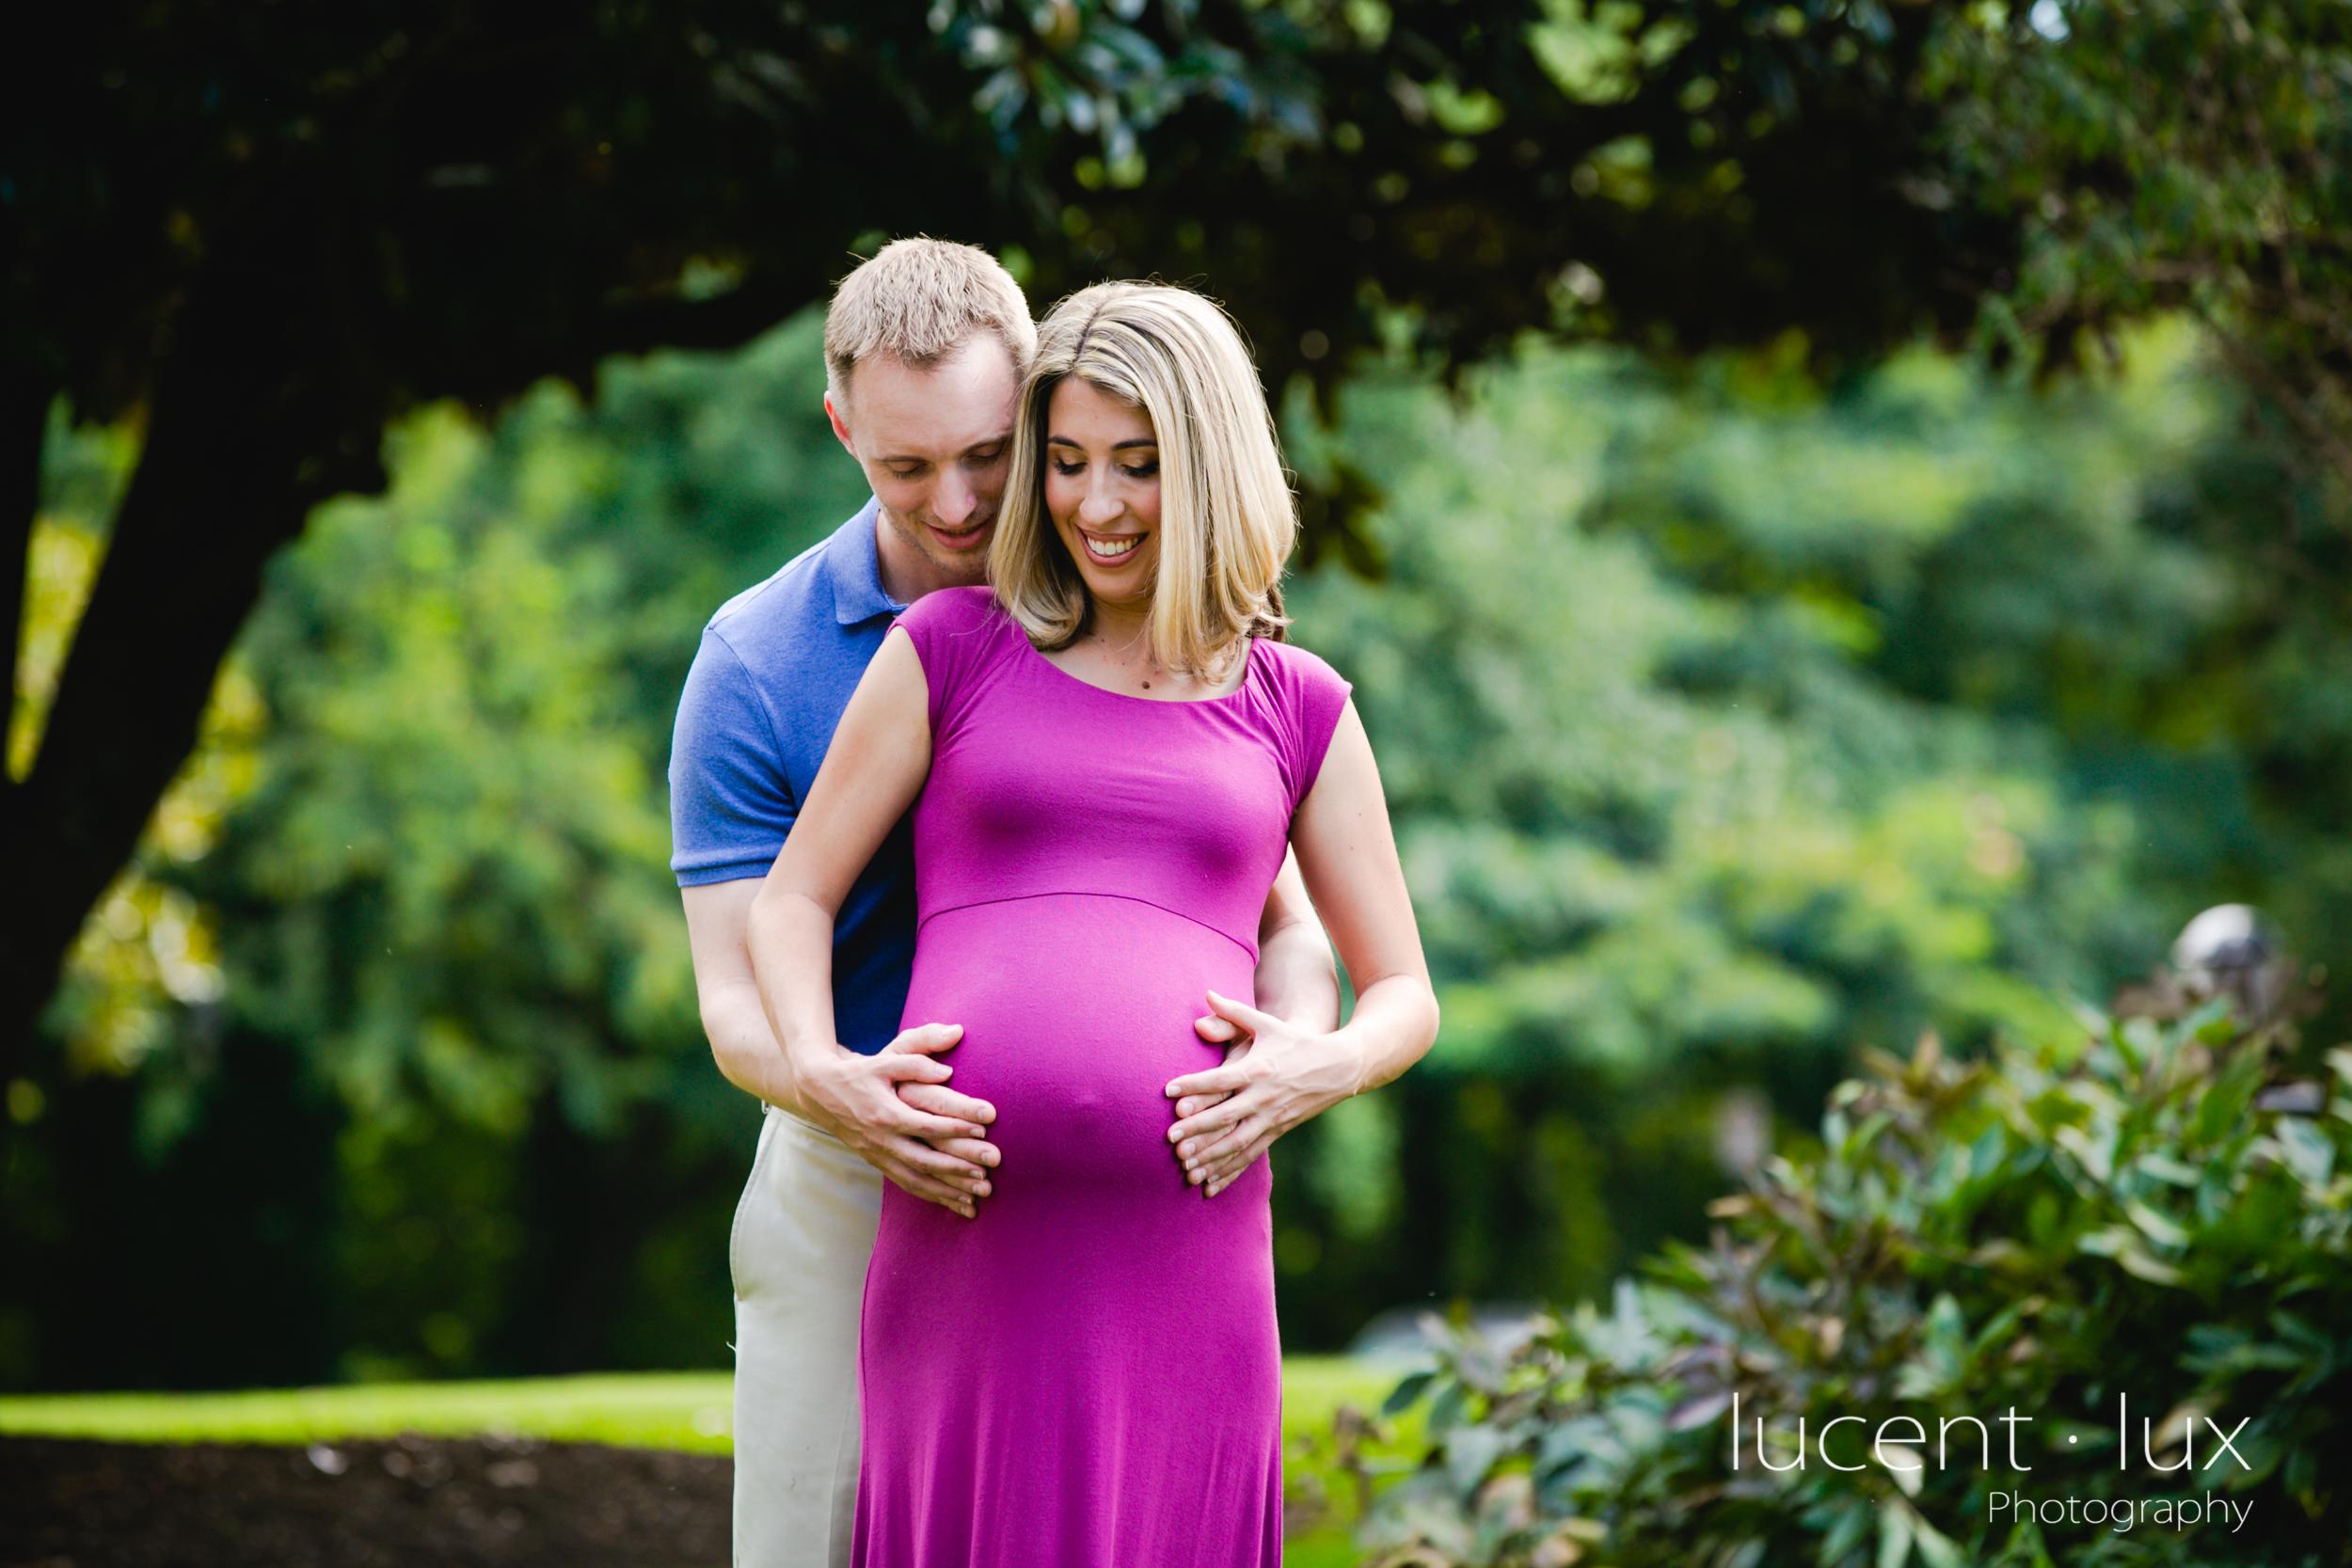 Maternity-Photography-Maryland-Baltimore-Photographer-Family-Portraits-Couple-Engagement-Newborn-202.jpg